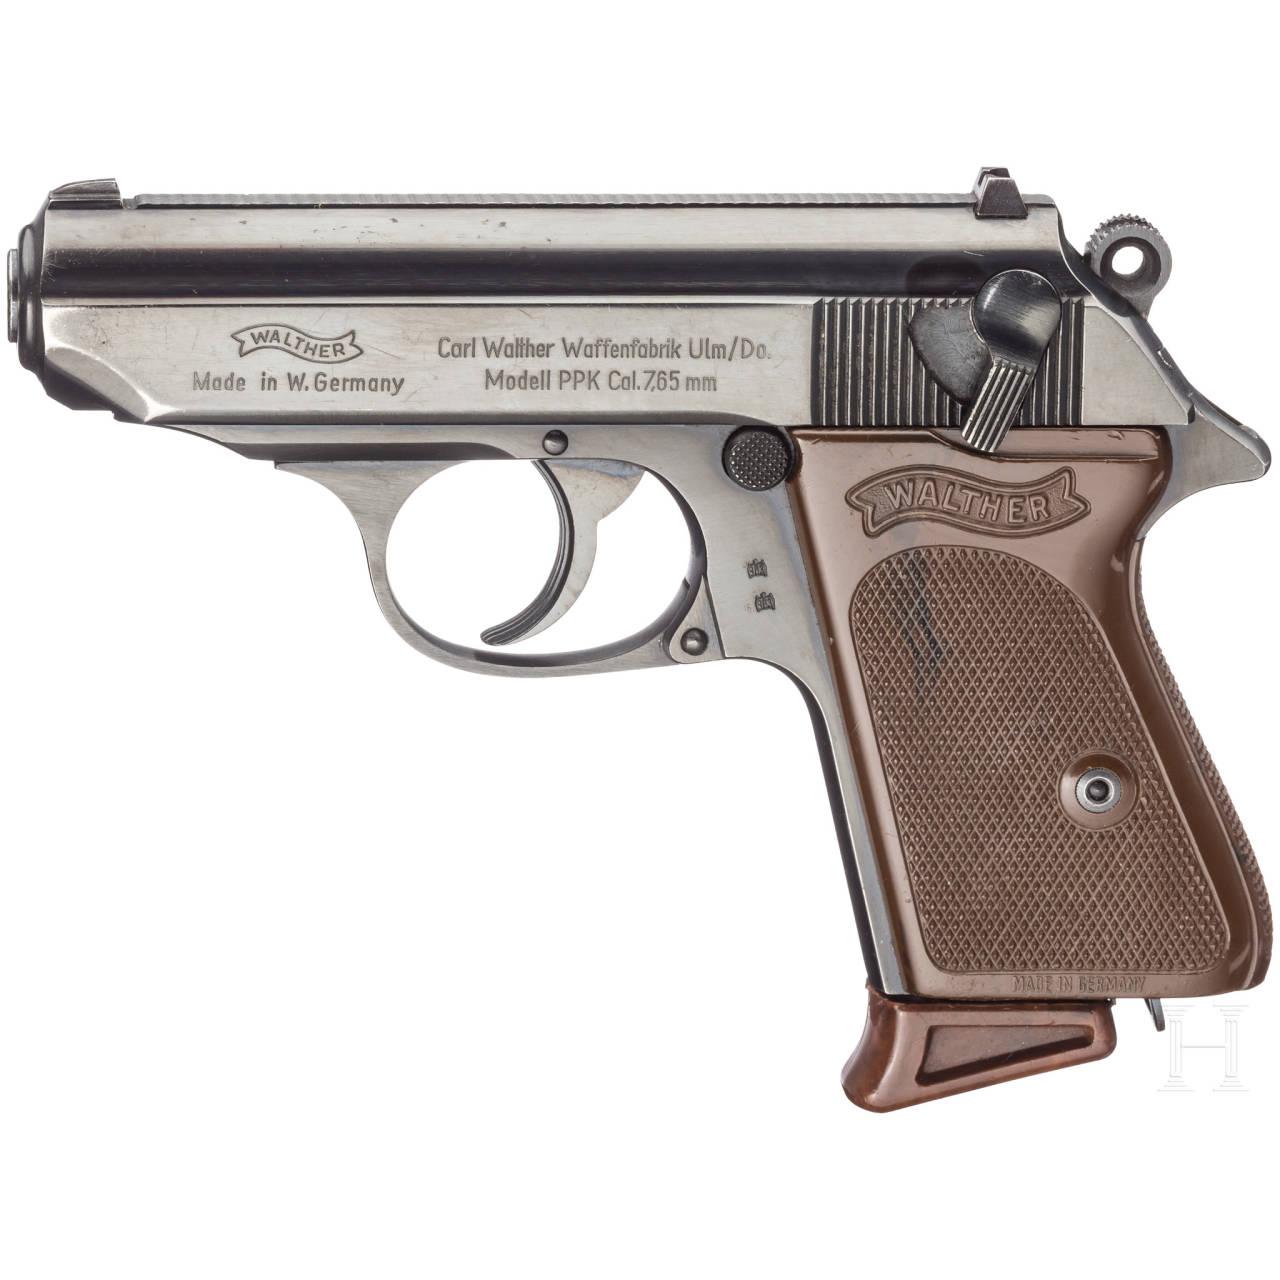 Walther PPK (P 21), Bundeswehr